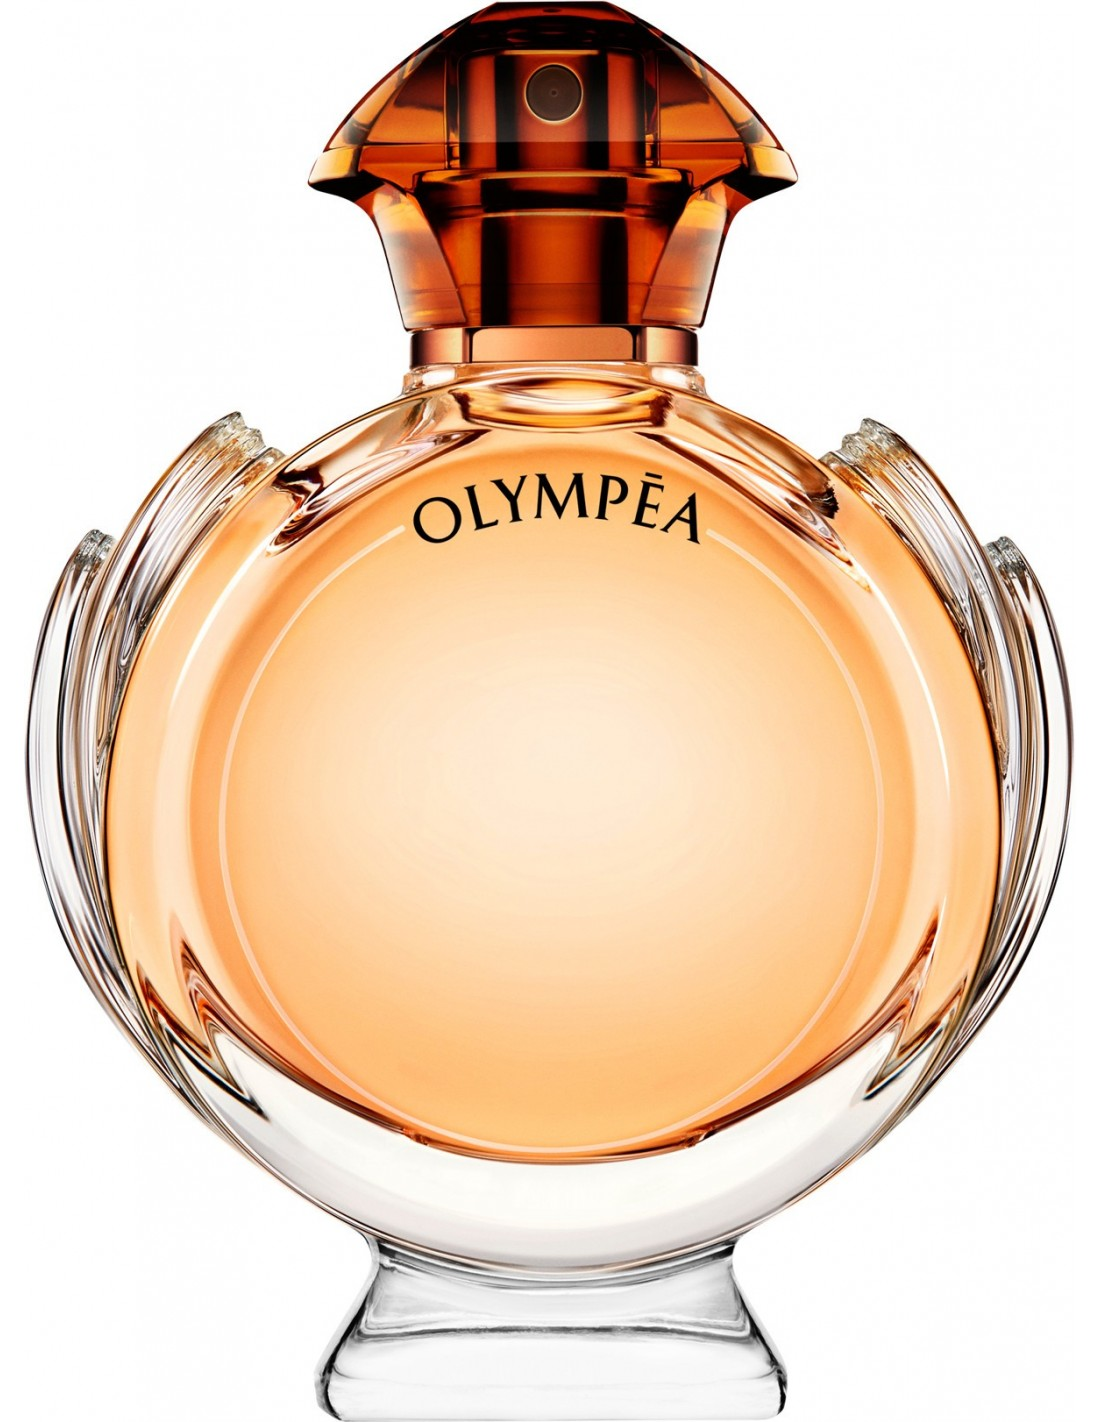 profumo olympea 100 ml tester prezzo